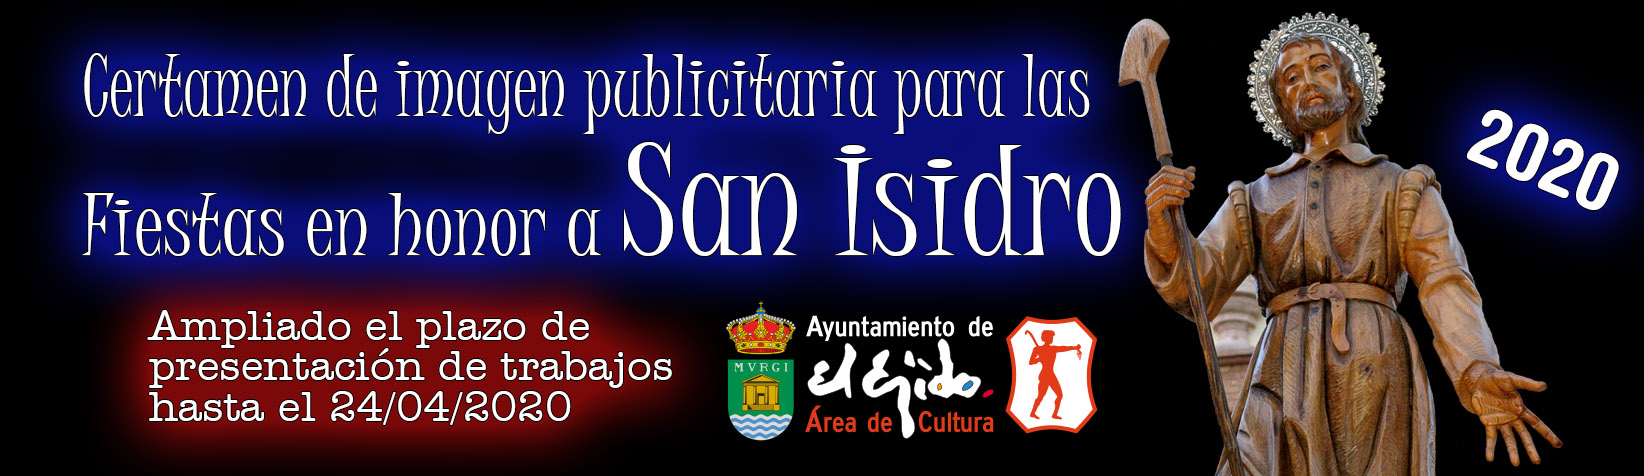 Slider San Isidro 2020 ampliacion